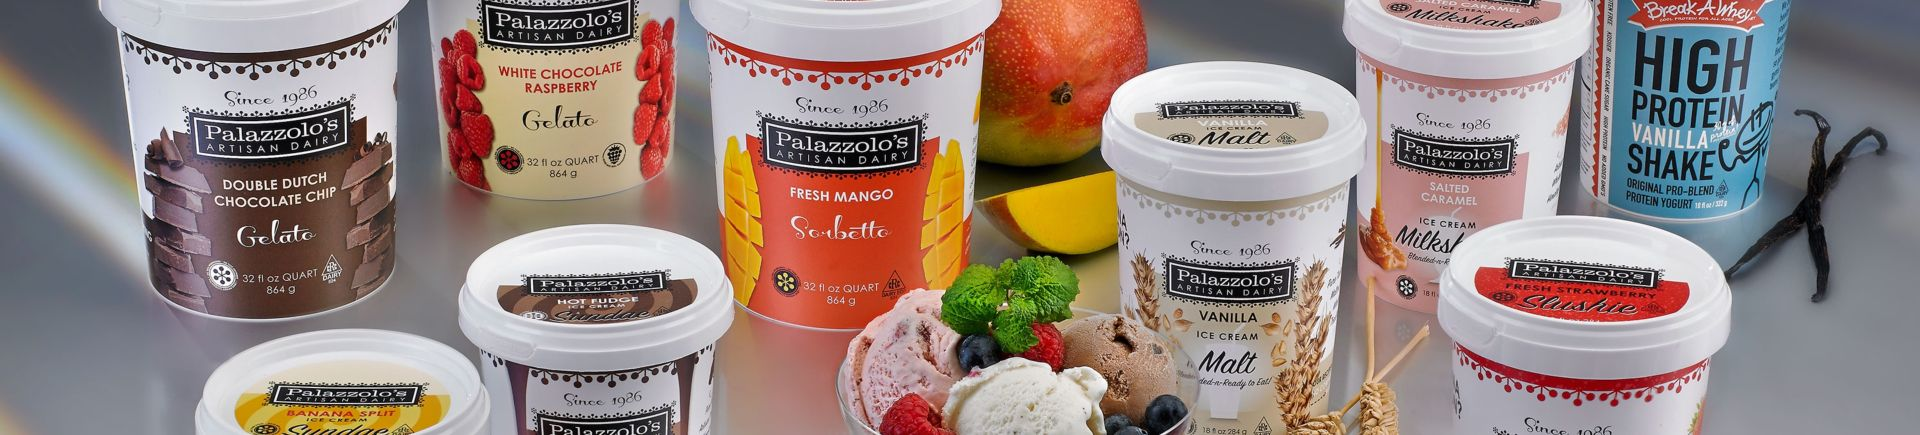 Palazzolo's Artisan Dairy